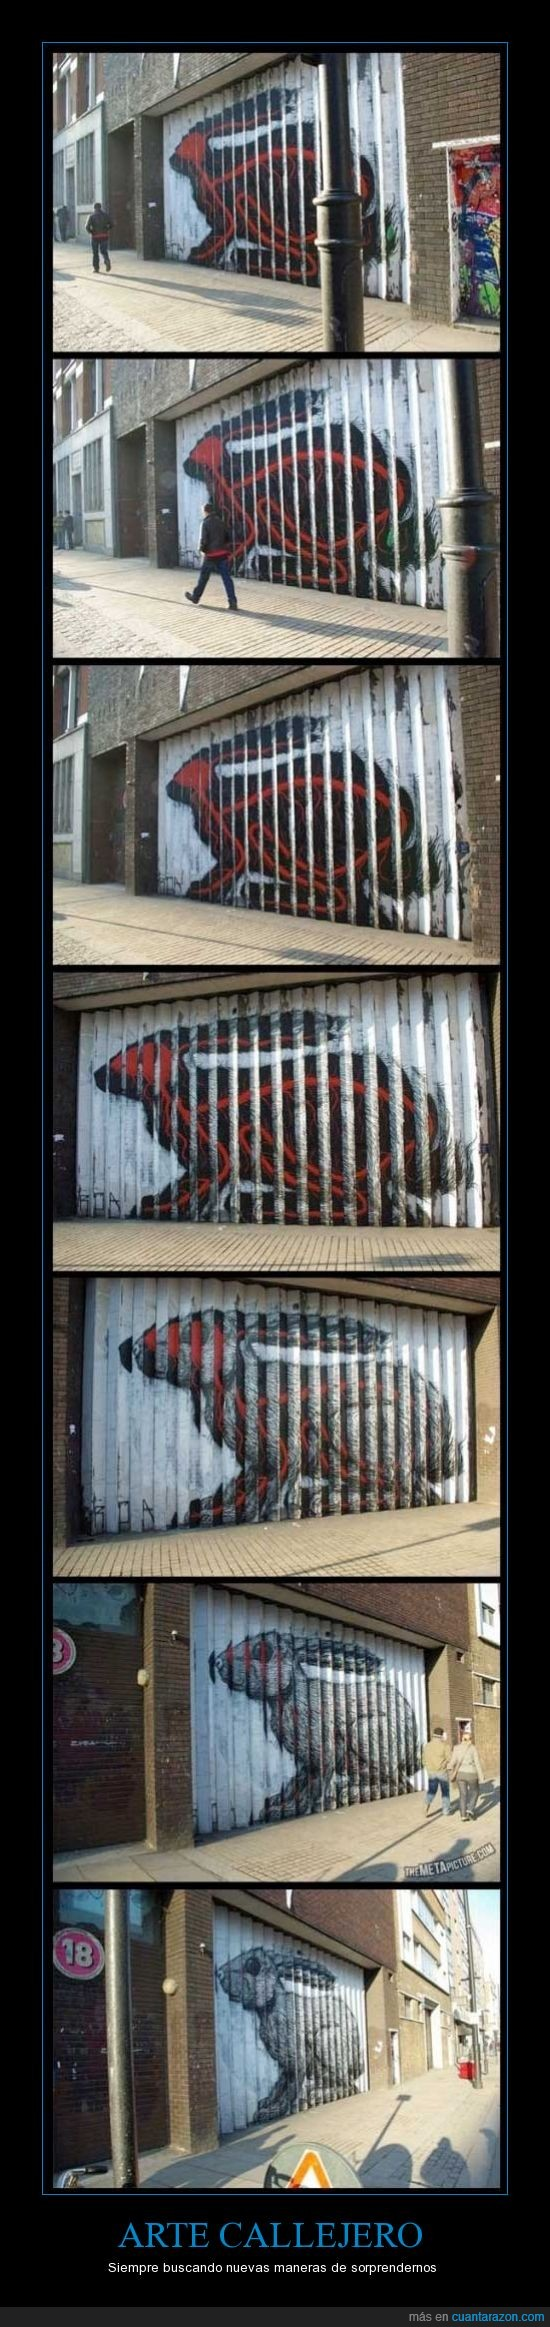 arte,calle,graffitti,lenticular